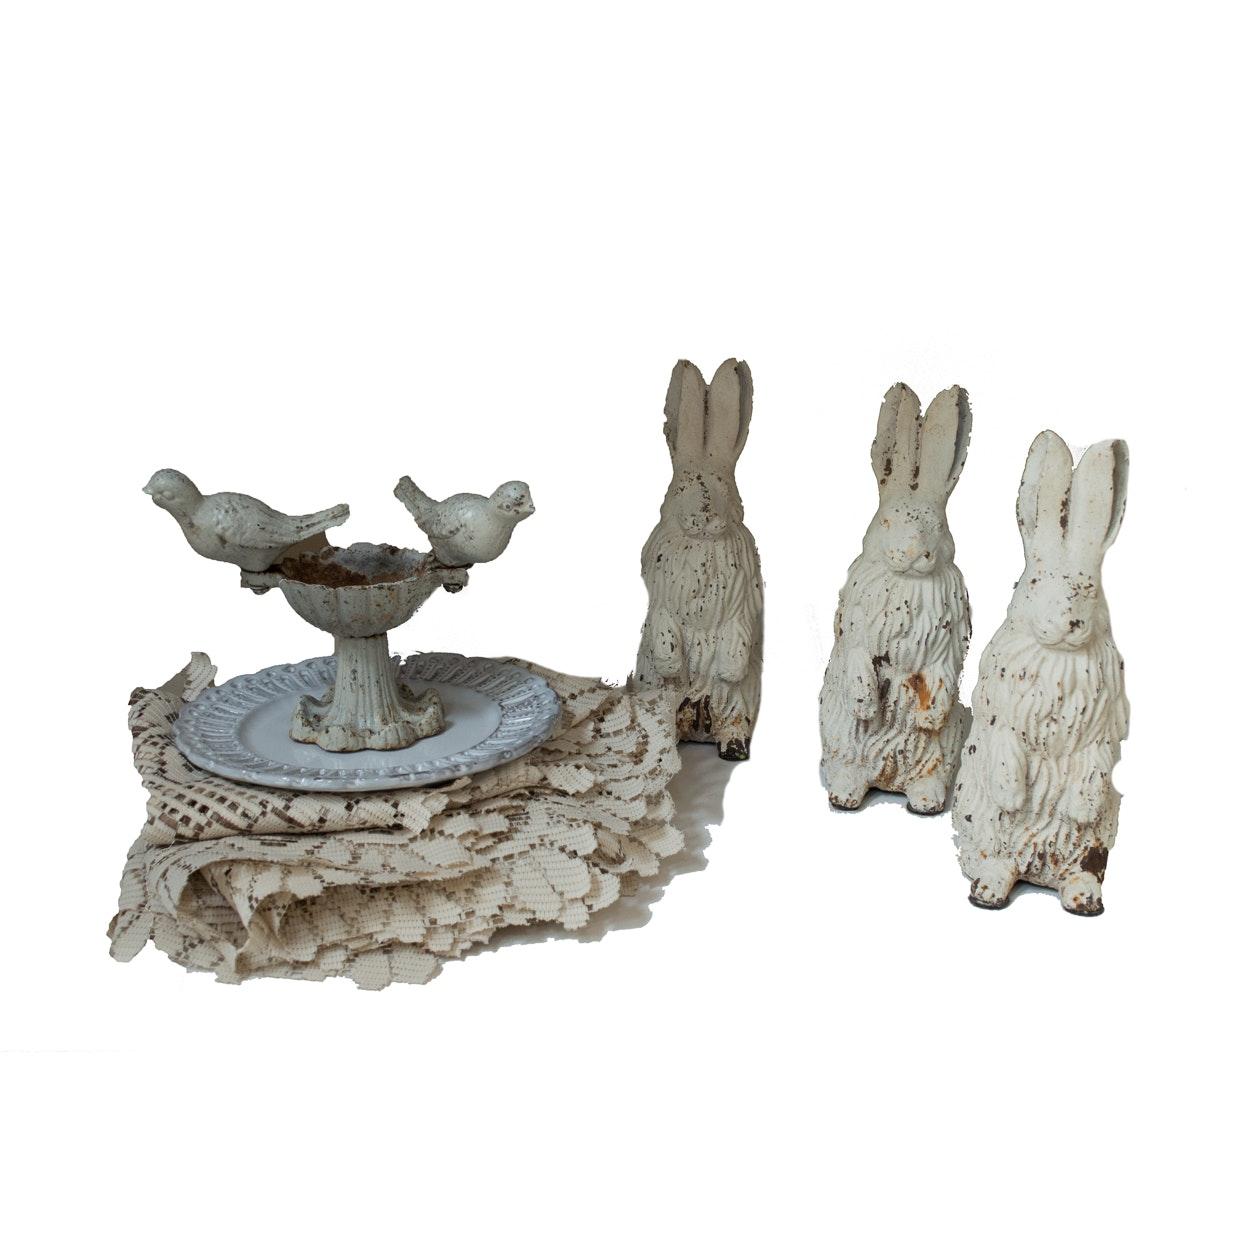 Cast Metal Rabbits, Bird Bath Table Decor, Plate, Prints and Linen Collectibles